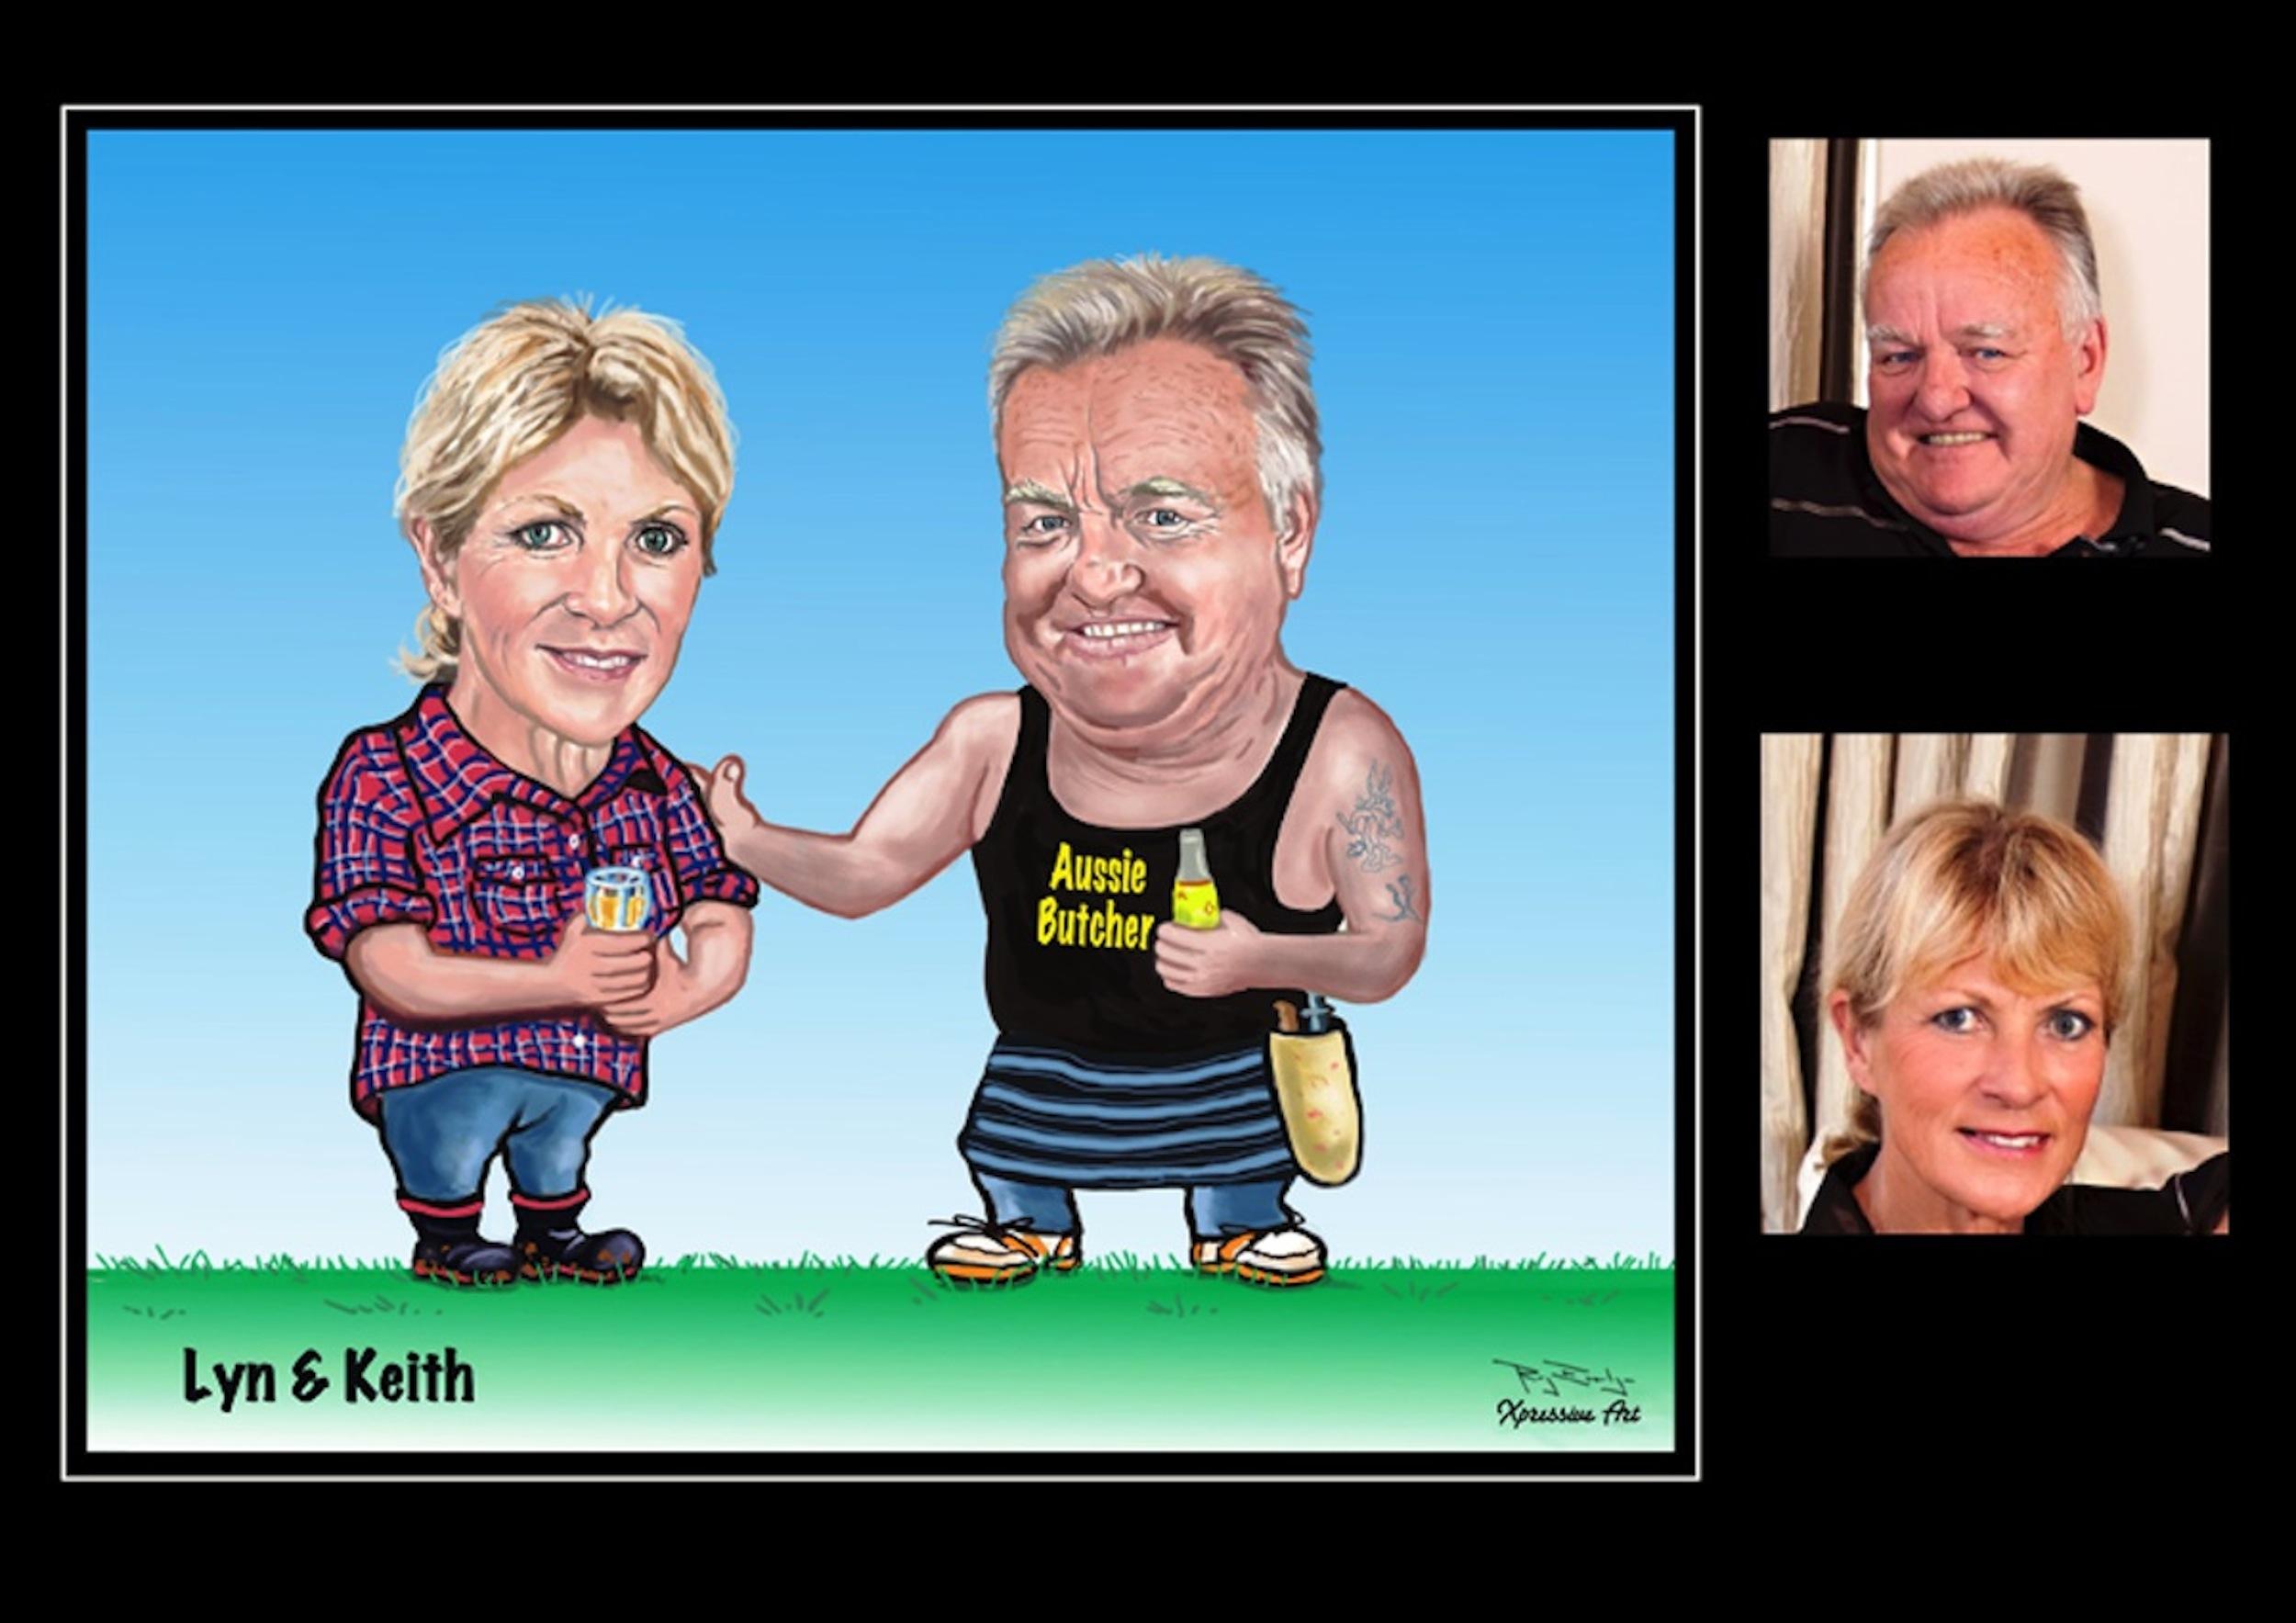 Lyn & Keith.